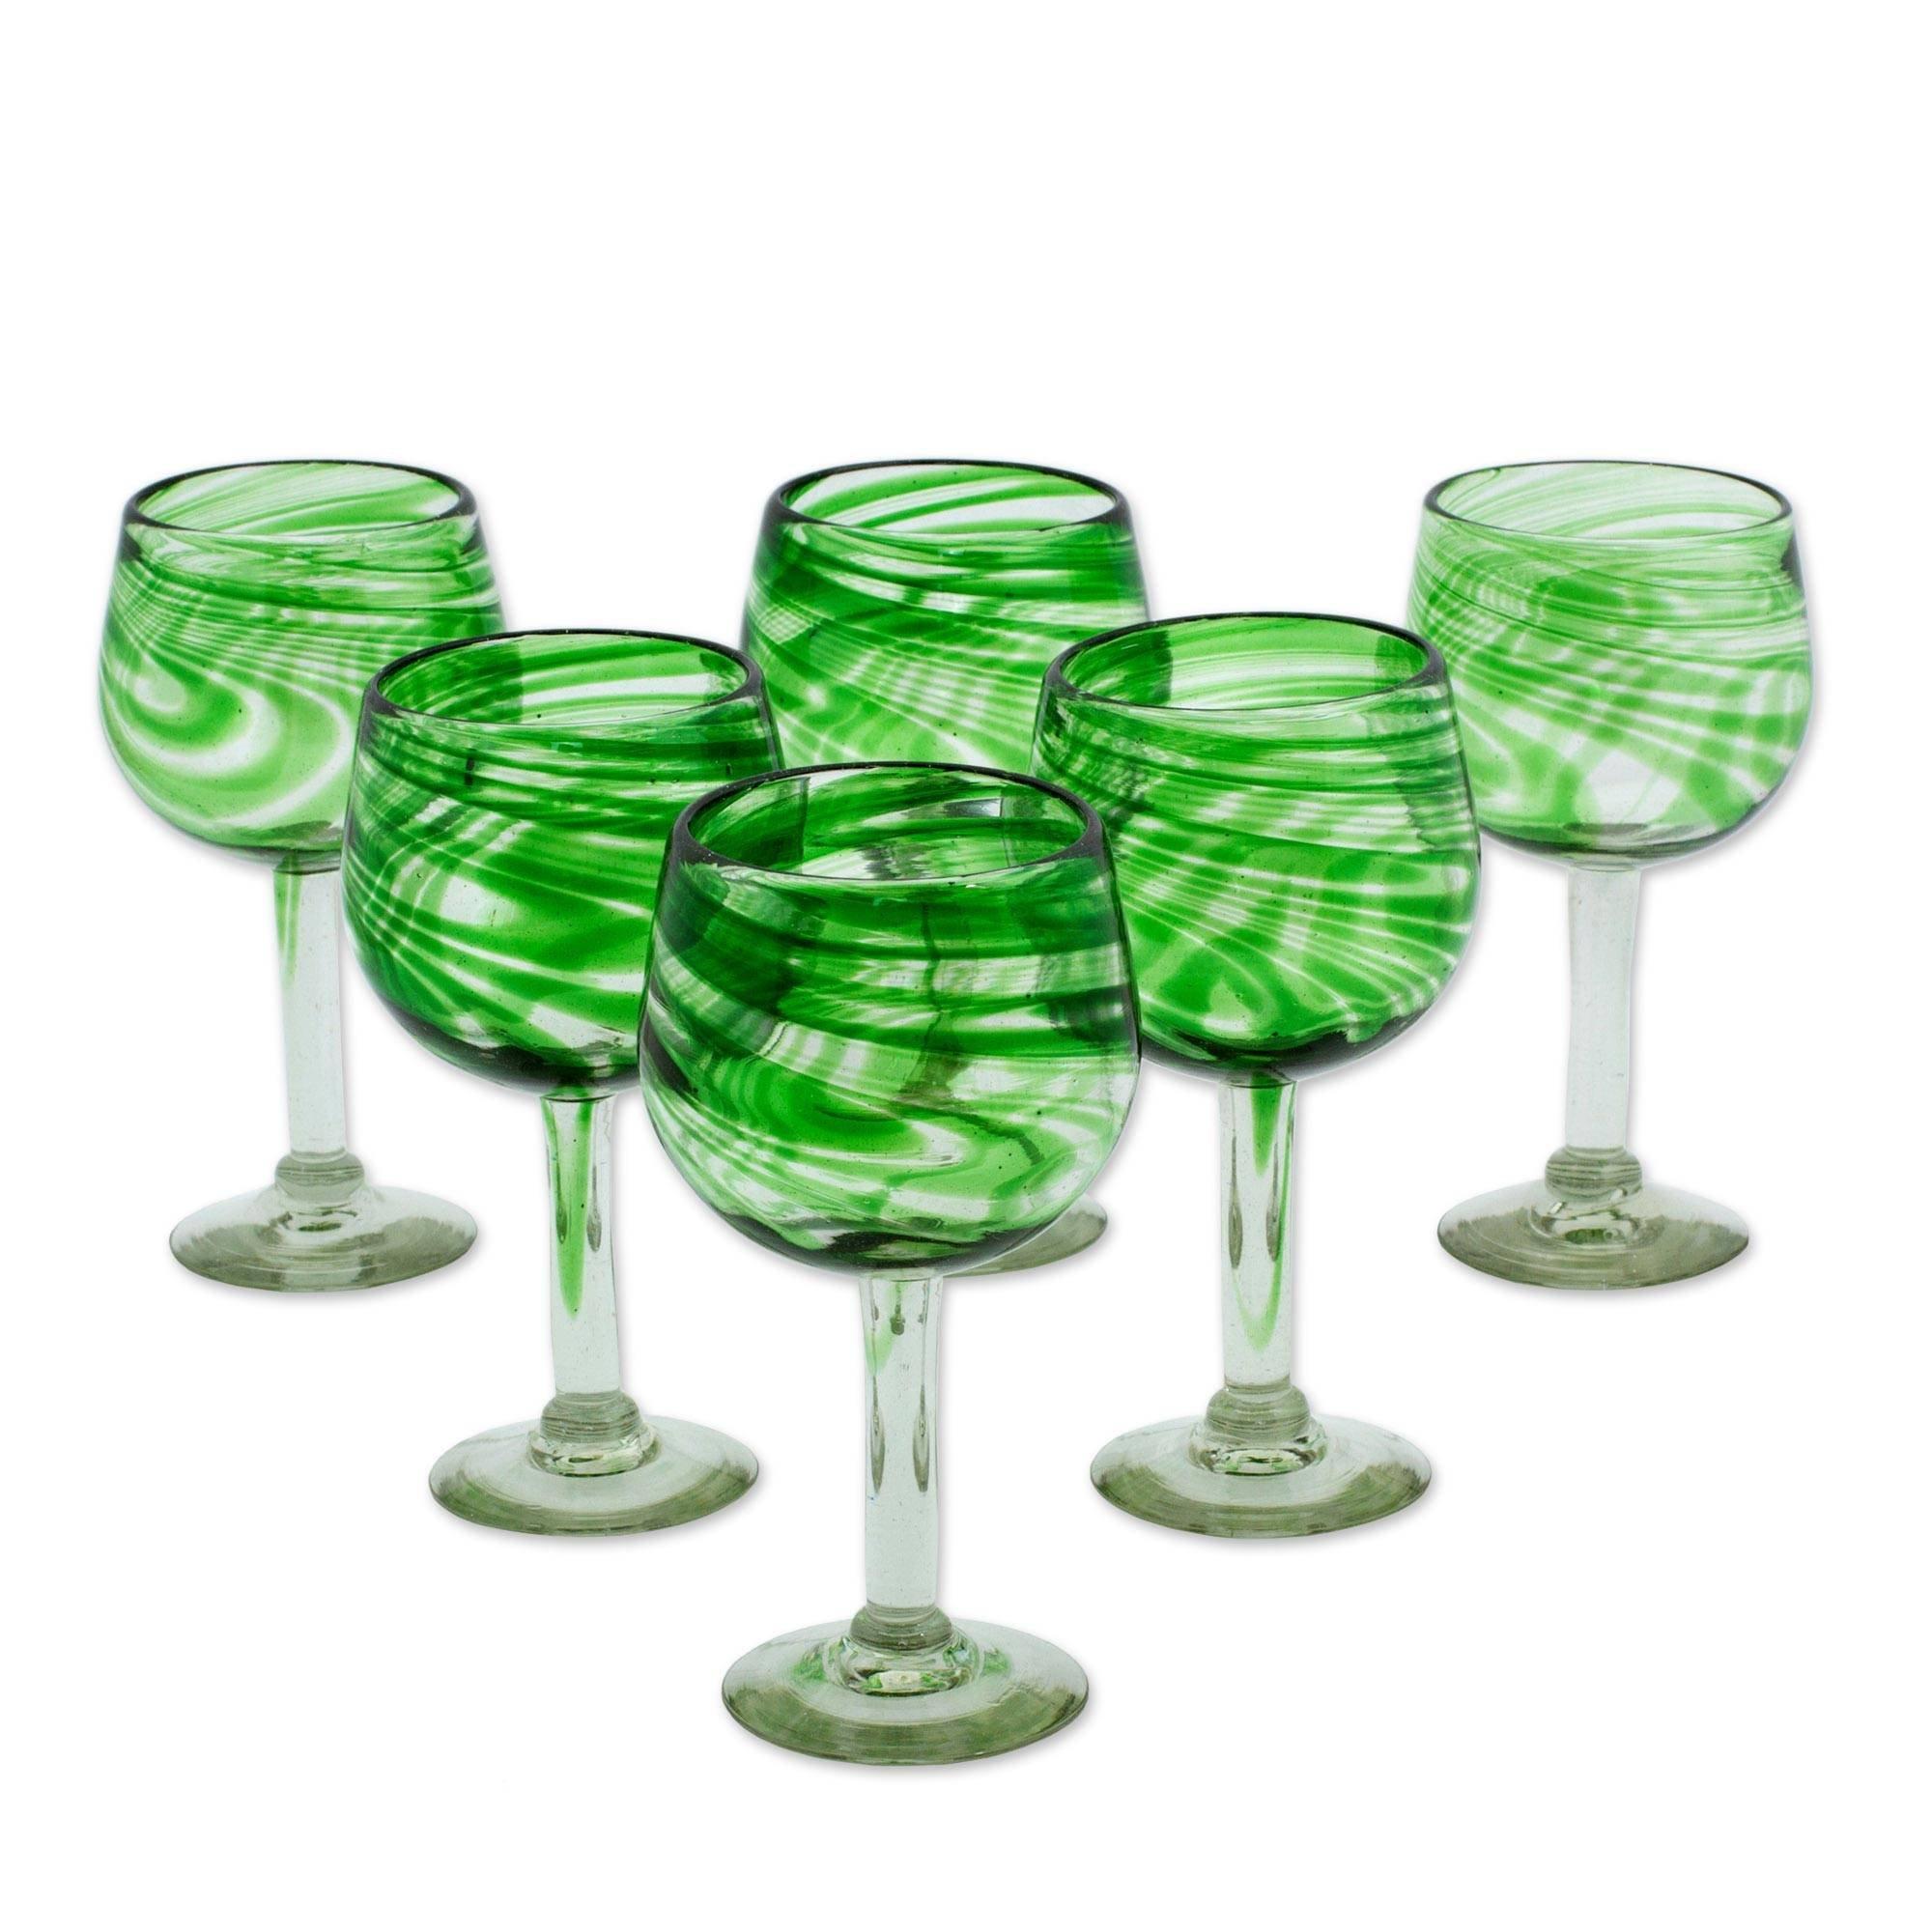 NOVICA Hand Blown Clear Green Glass Wine Glasses, 13 oz, Emerald Essence' (set of 6)